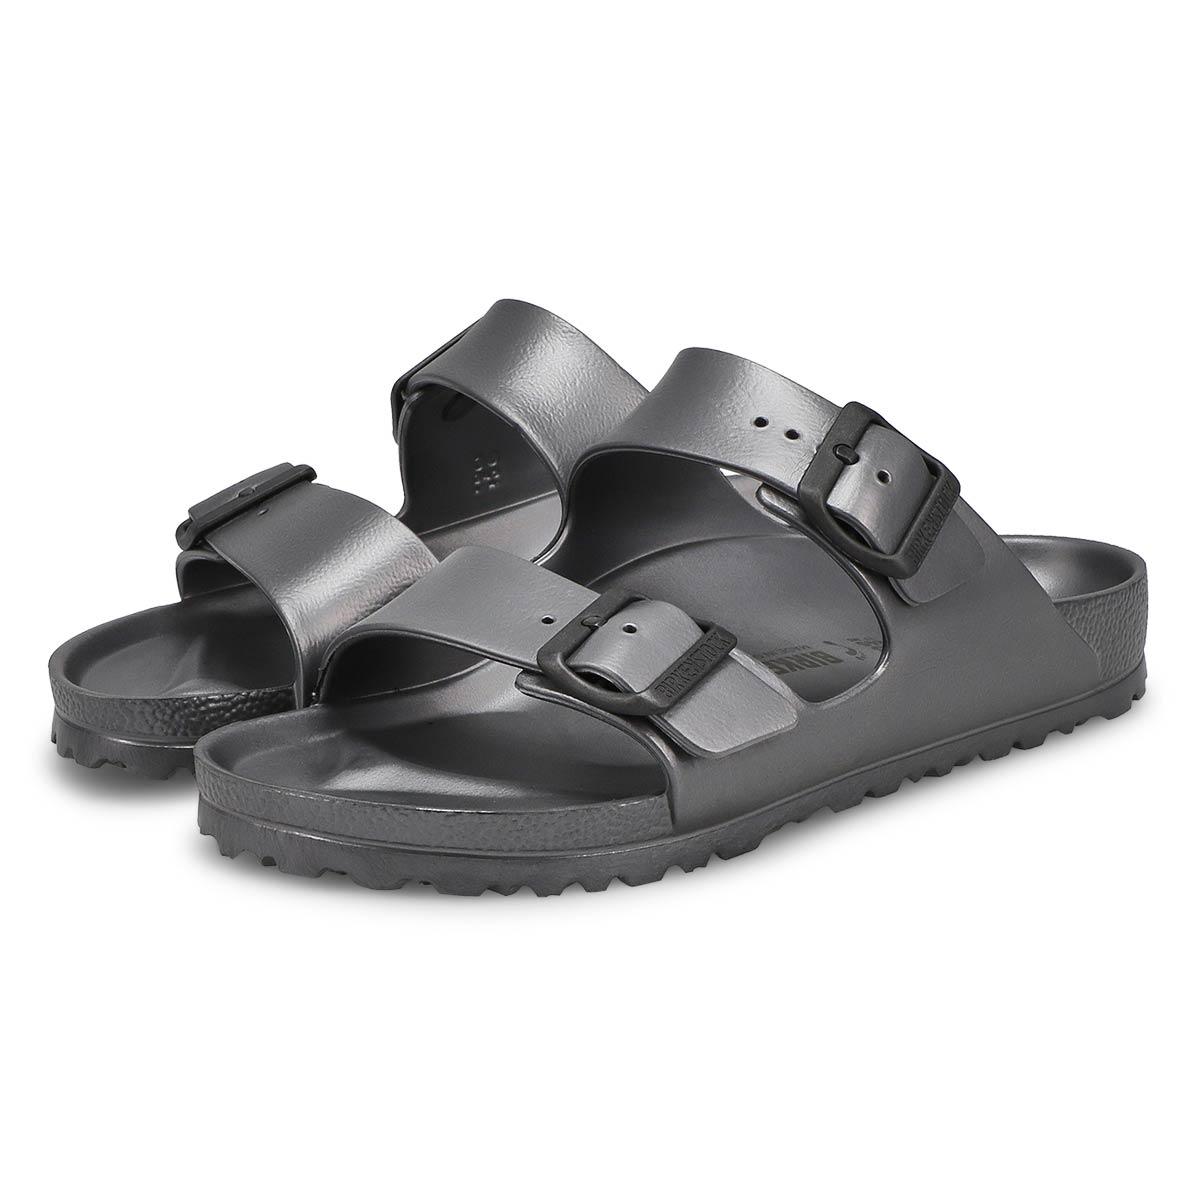 Women's Arizona EVA Narrow Sandal - Metallic